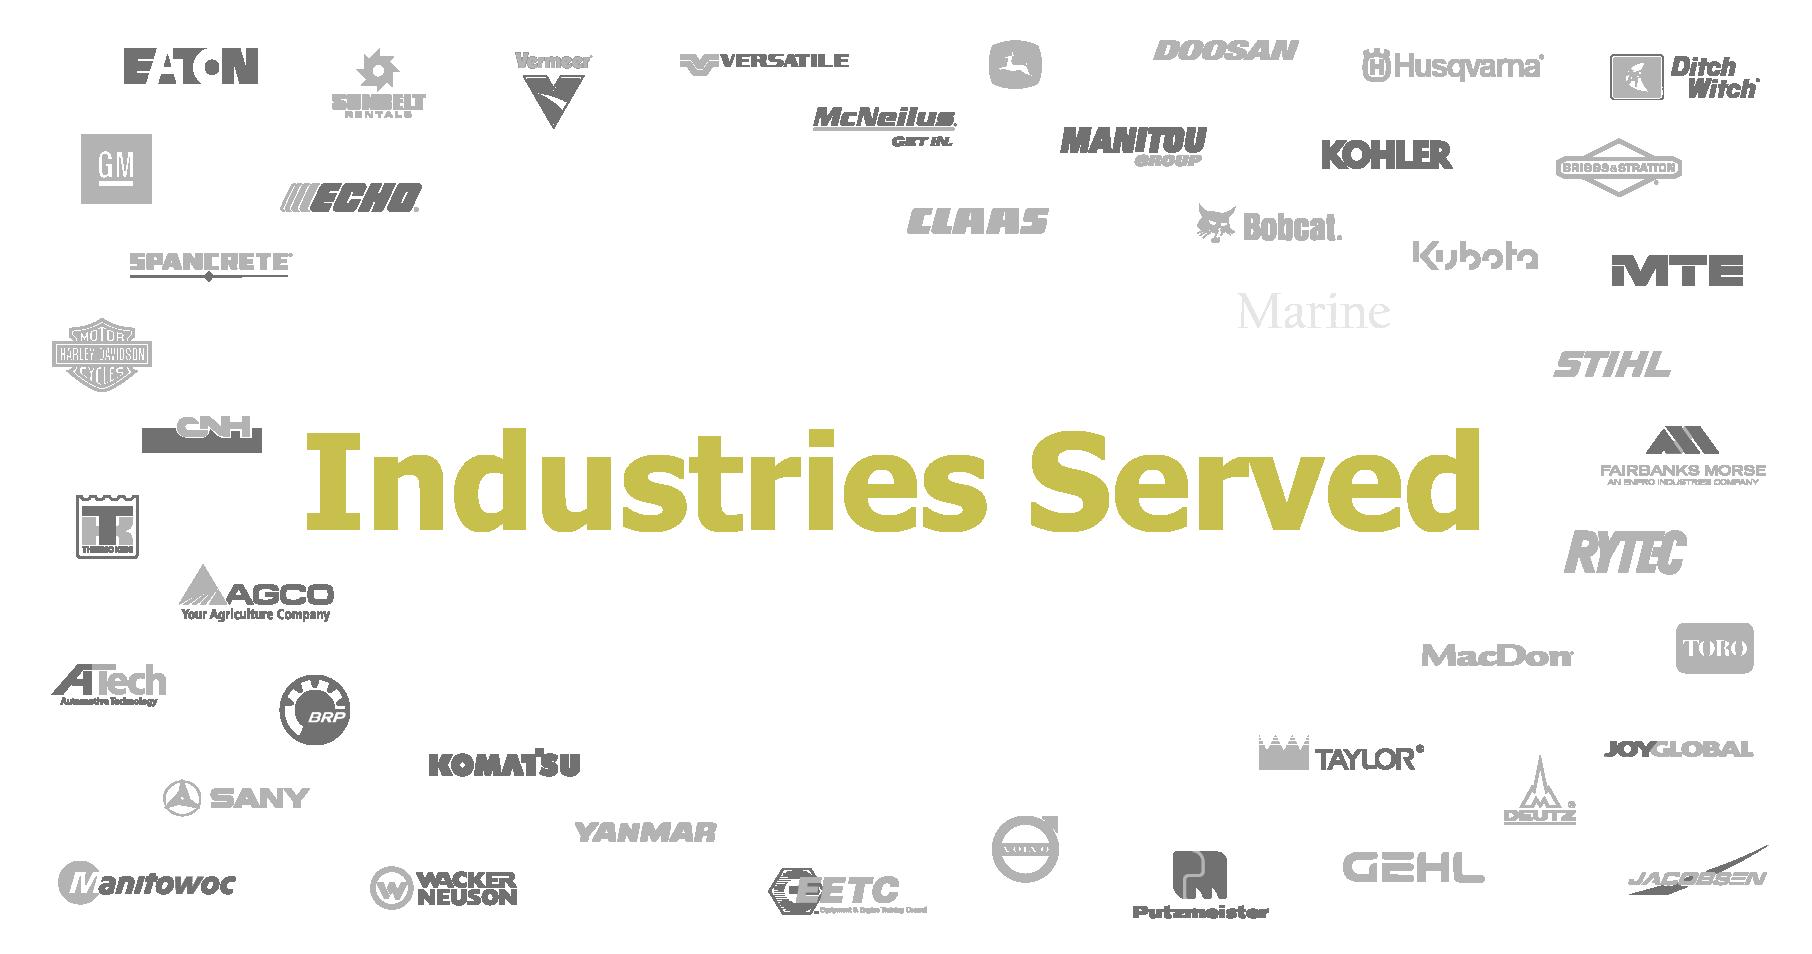 Industries served 2018